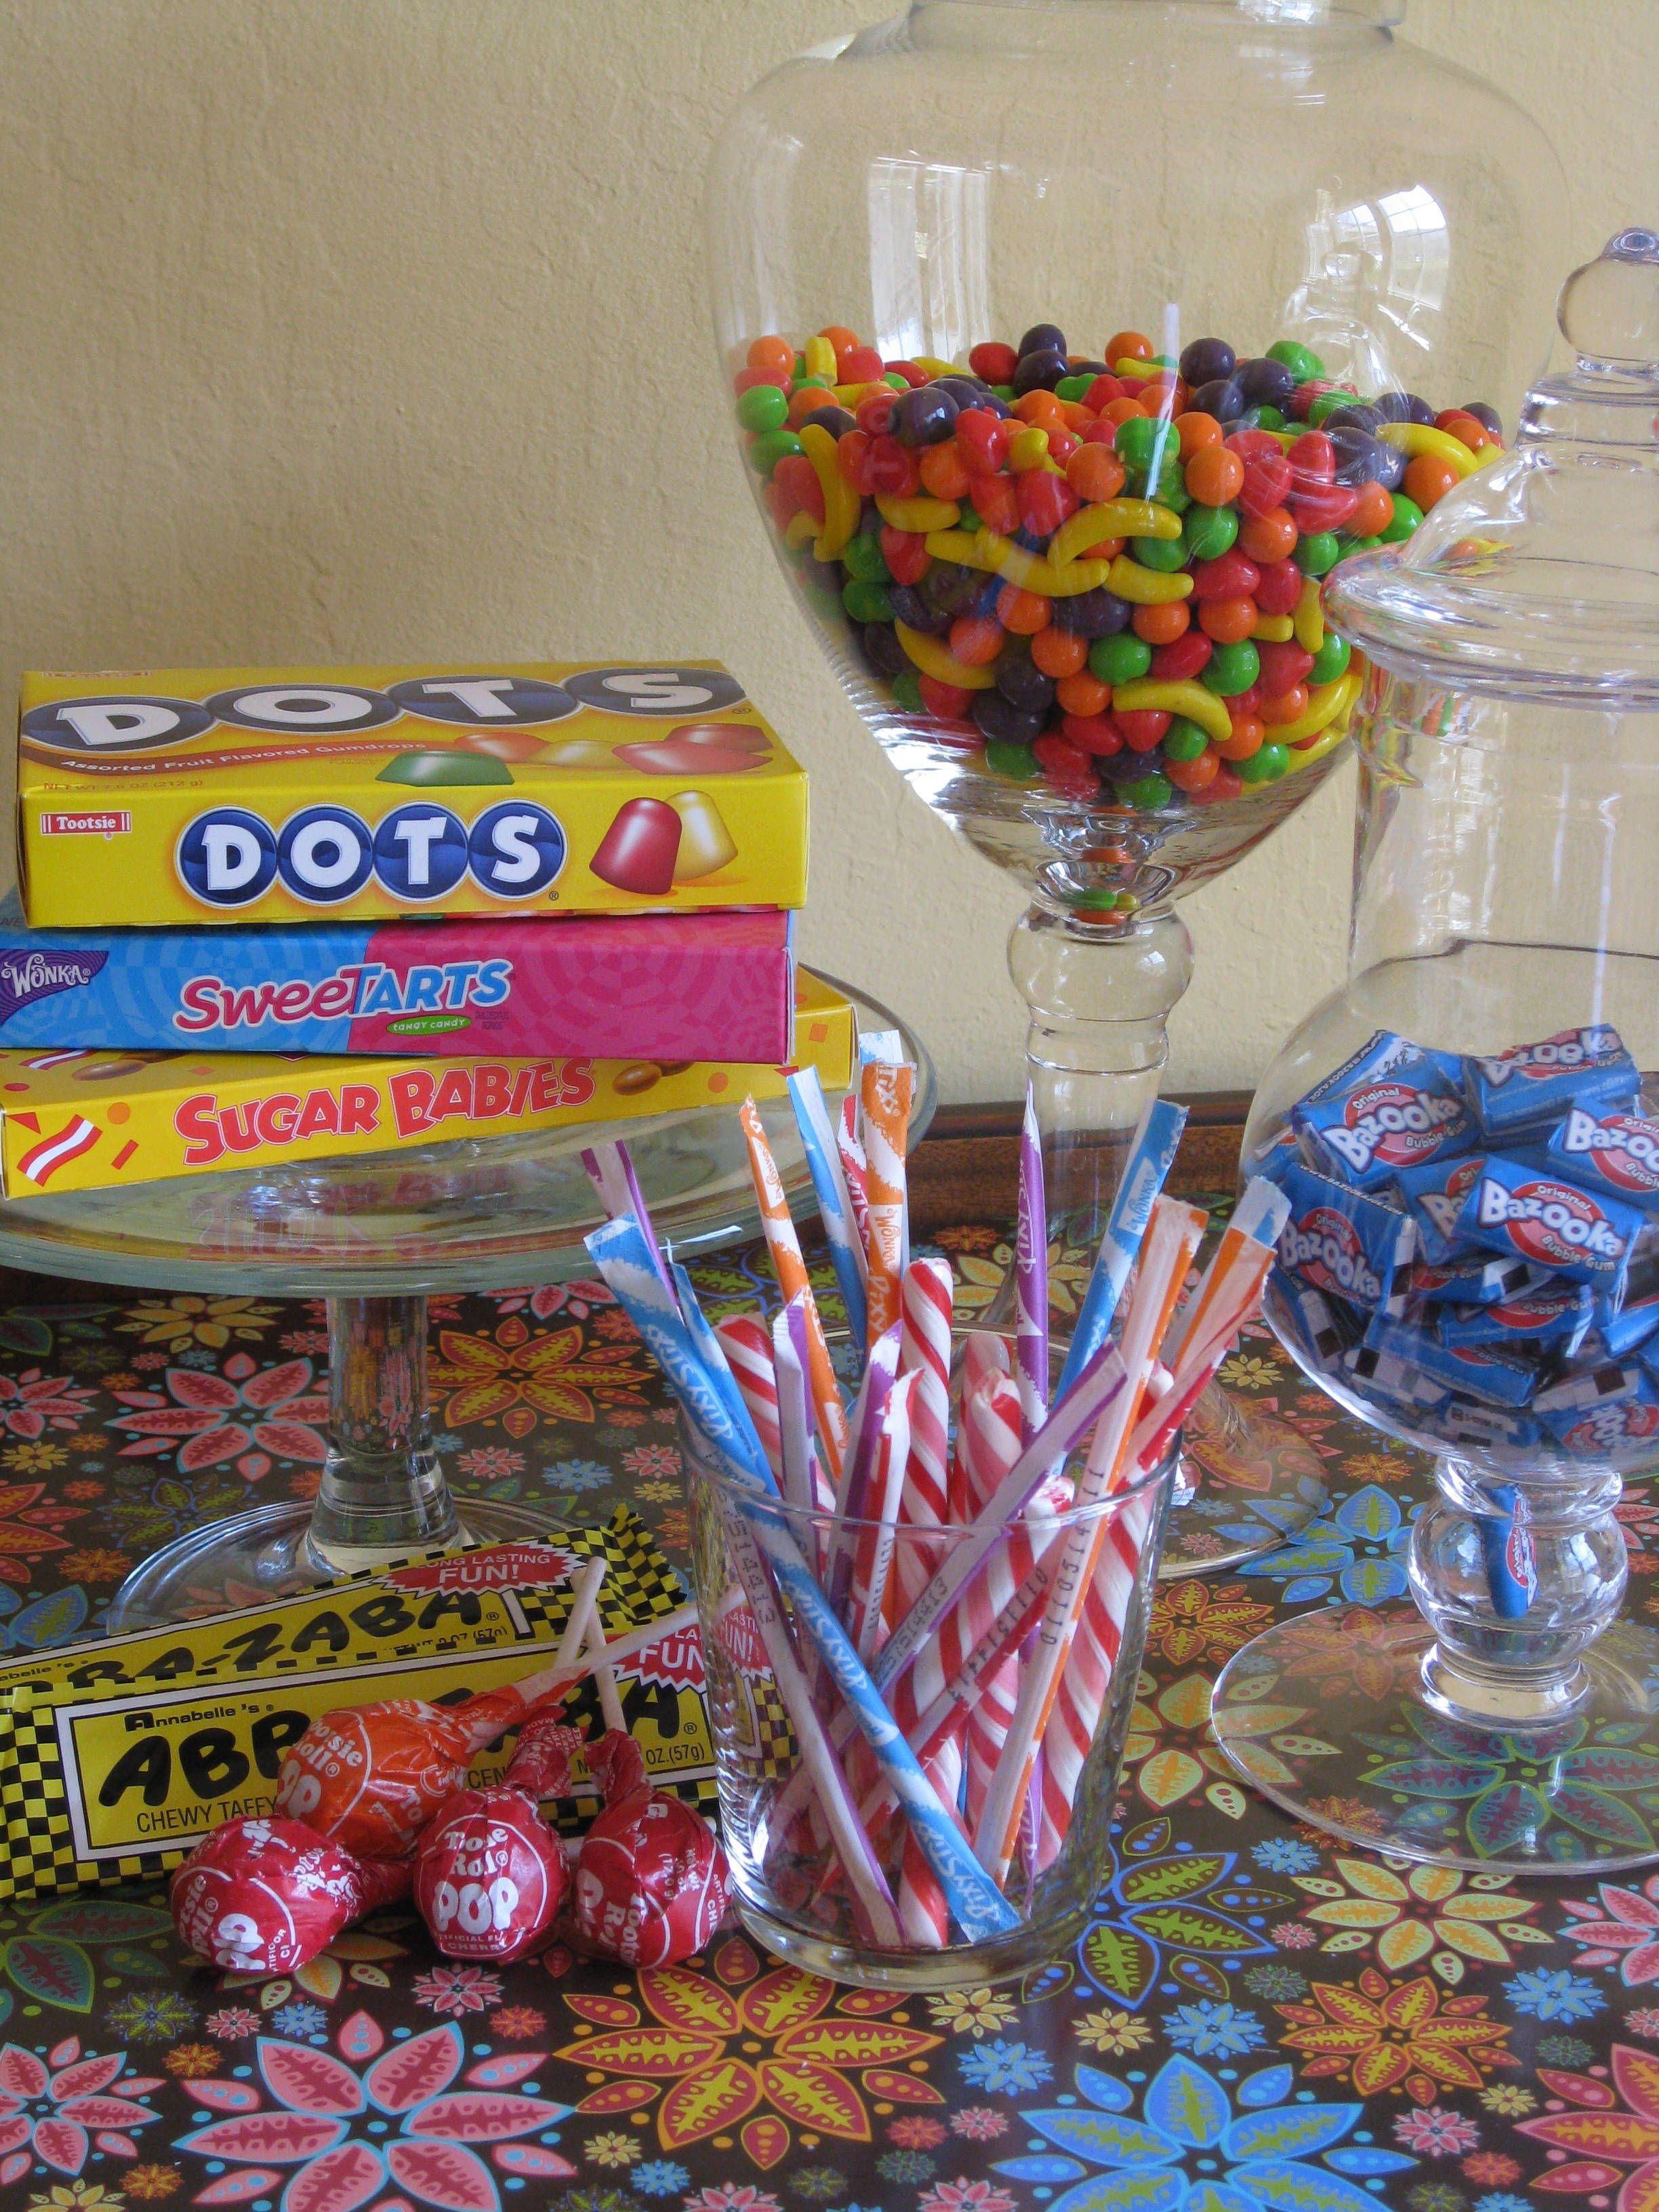 80s Theme Party Food Ideas - 1980s theme wedding anniversary party idea